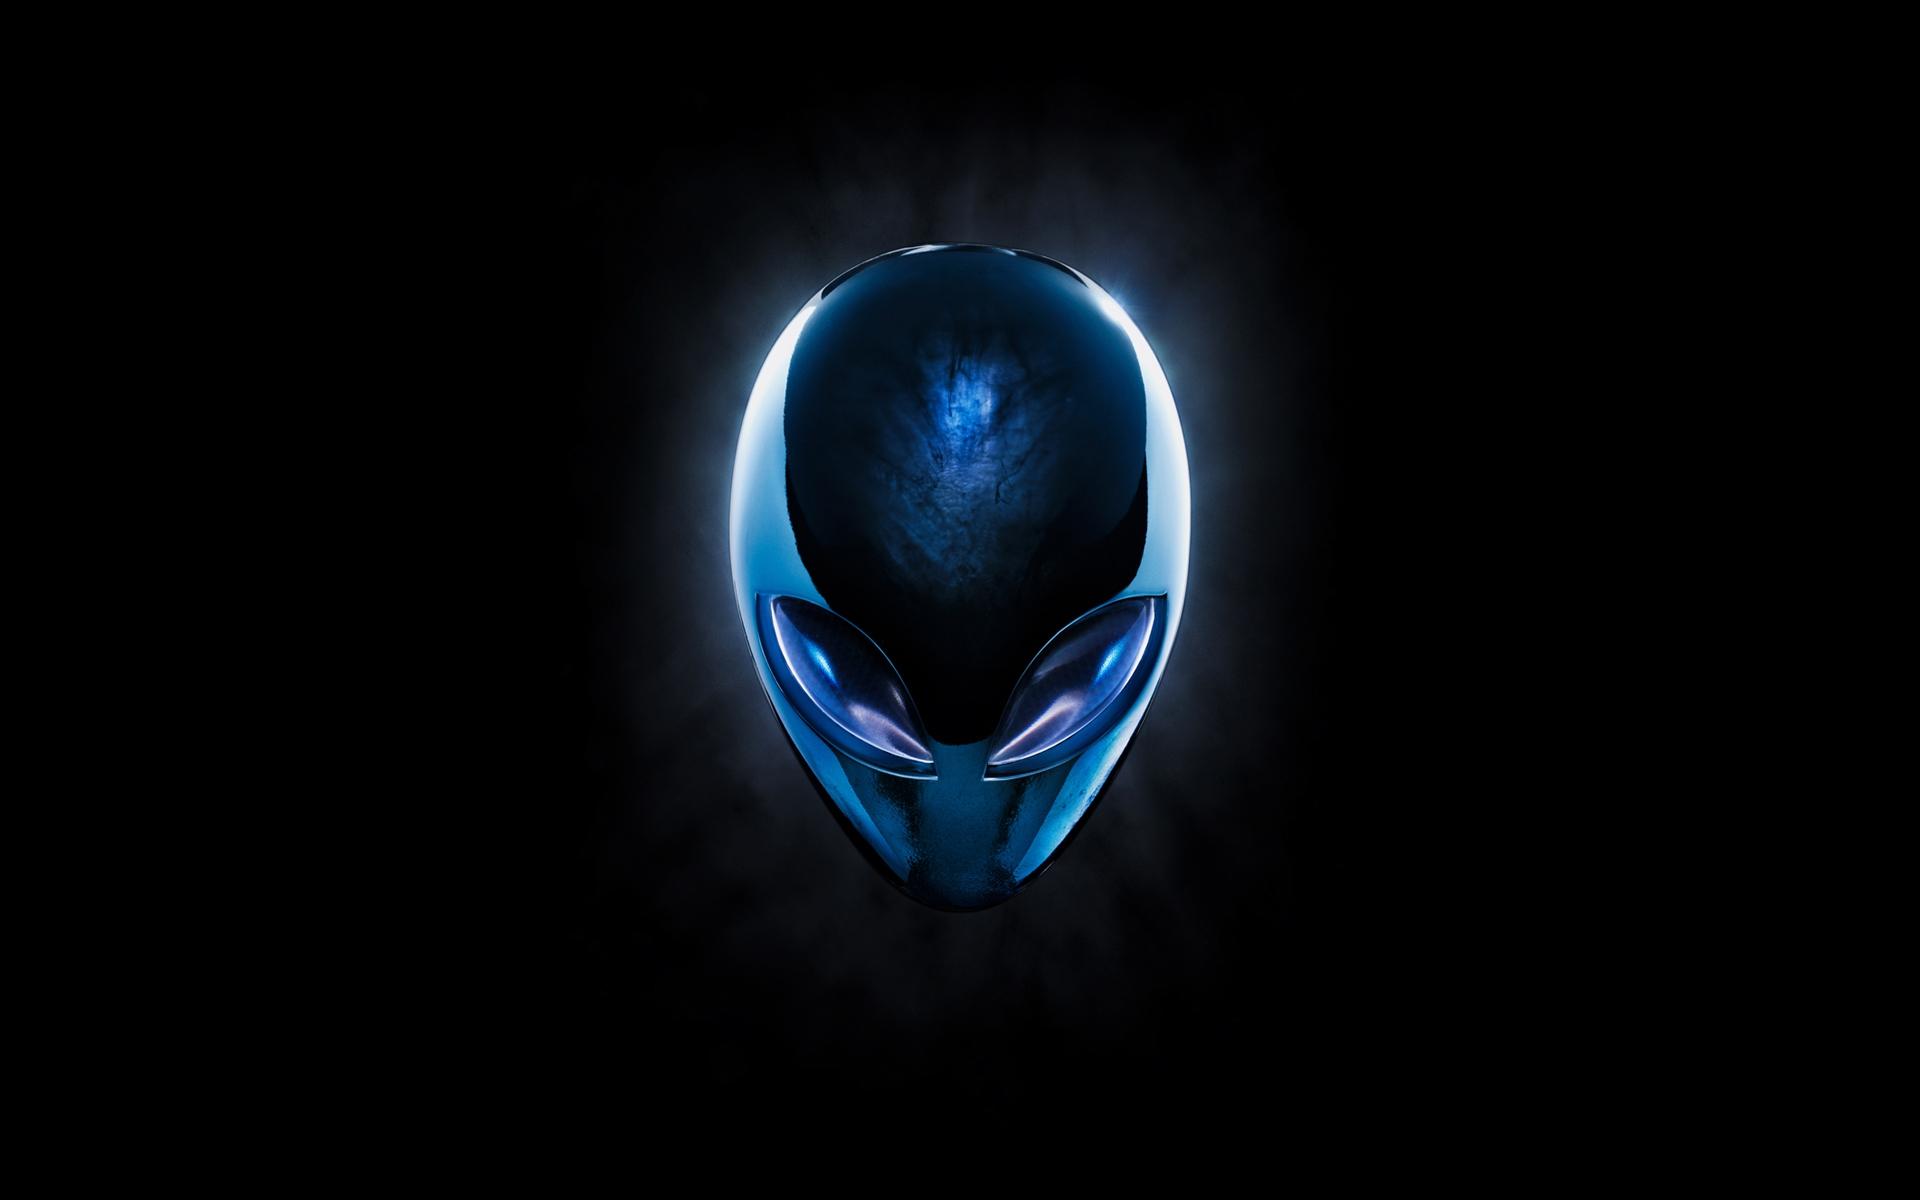 Alienwares Most Powerful Desktop Configuration Allows Tomb Raider 1920x1200